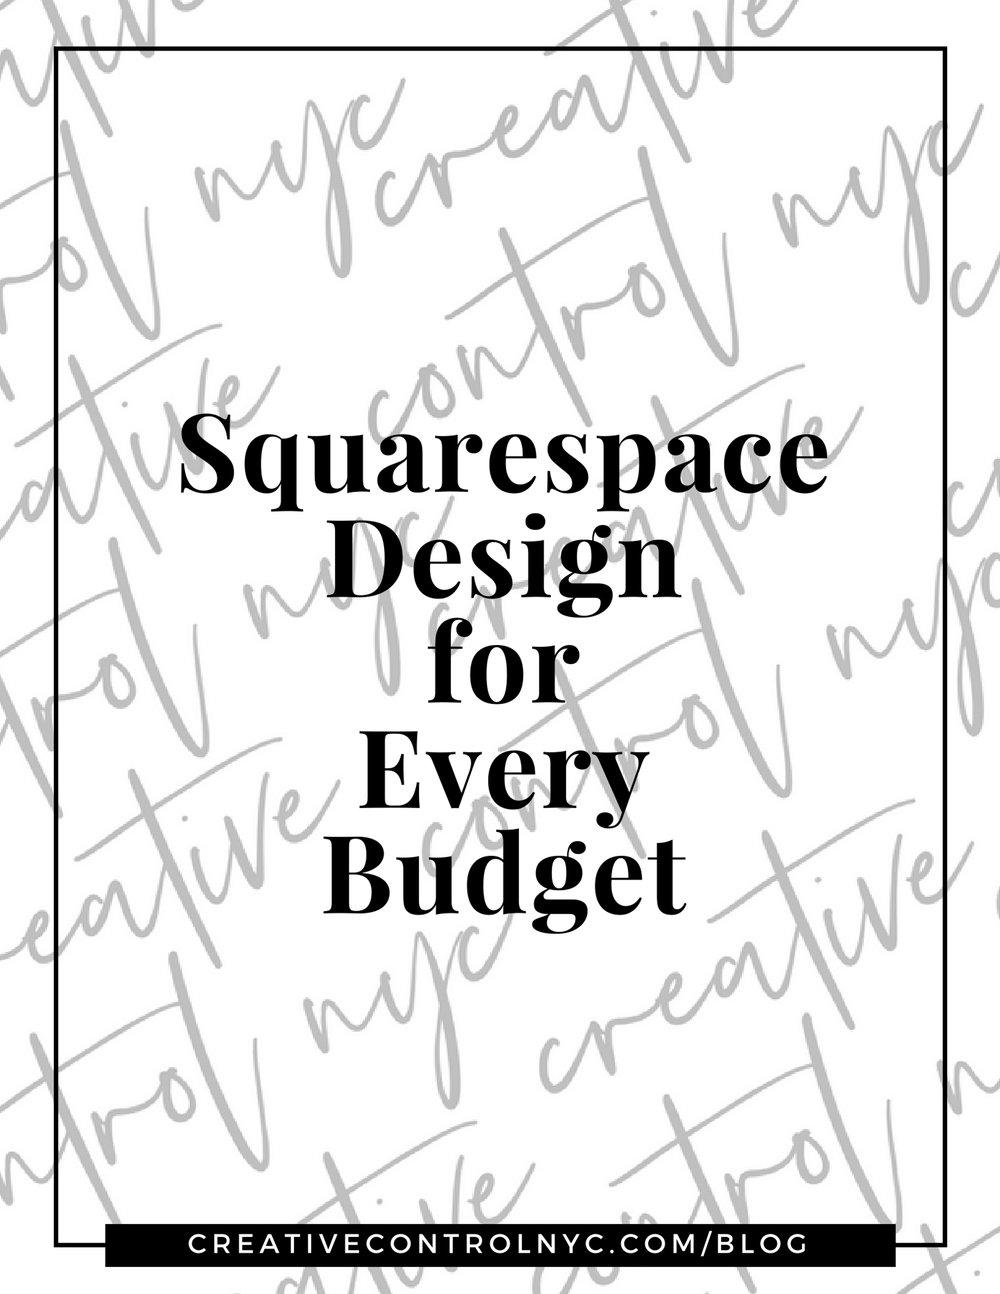 Creative Control NYC - Blog Post - Squarespace Design for Every Budget.jpg